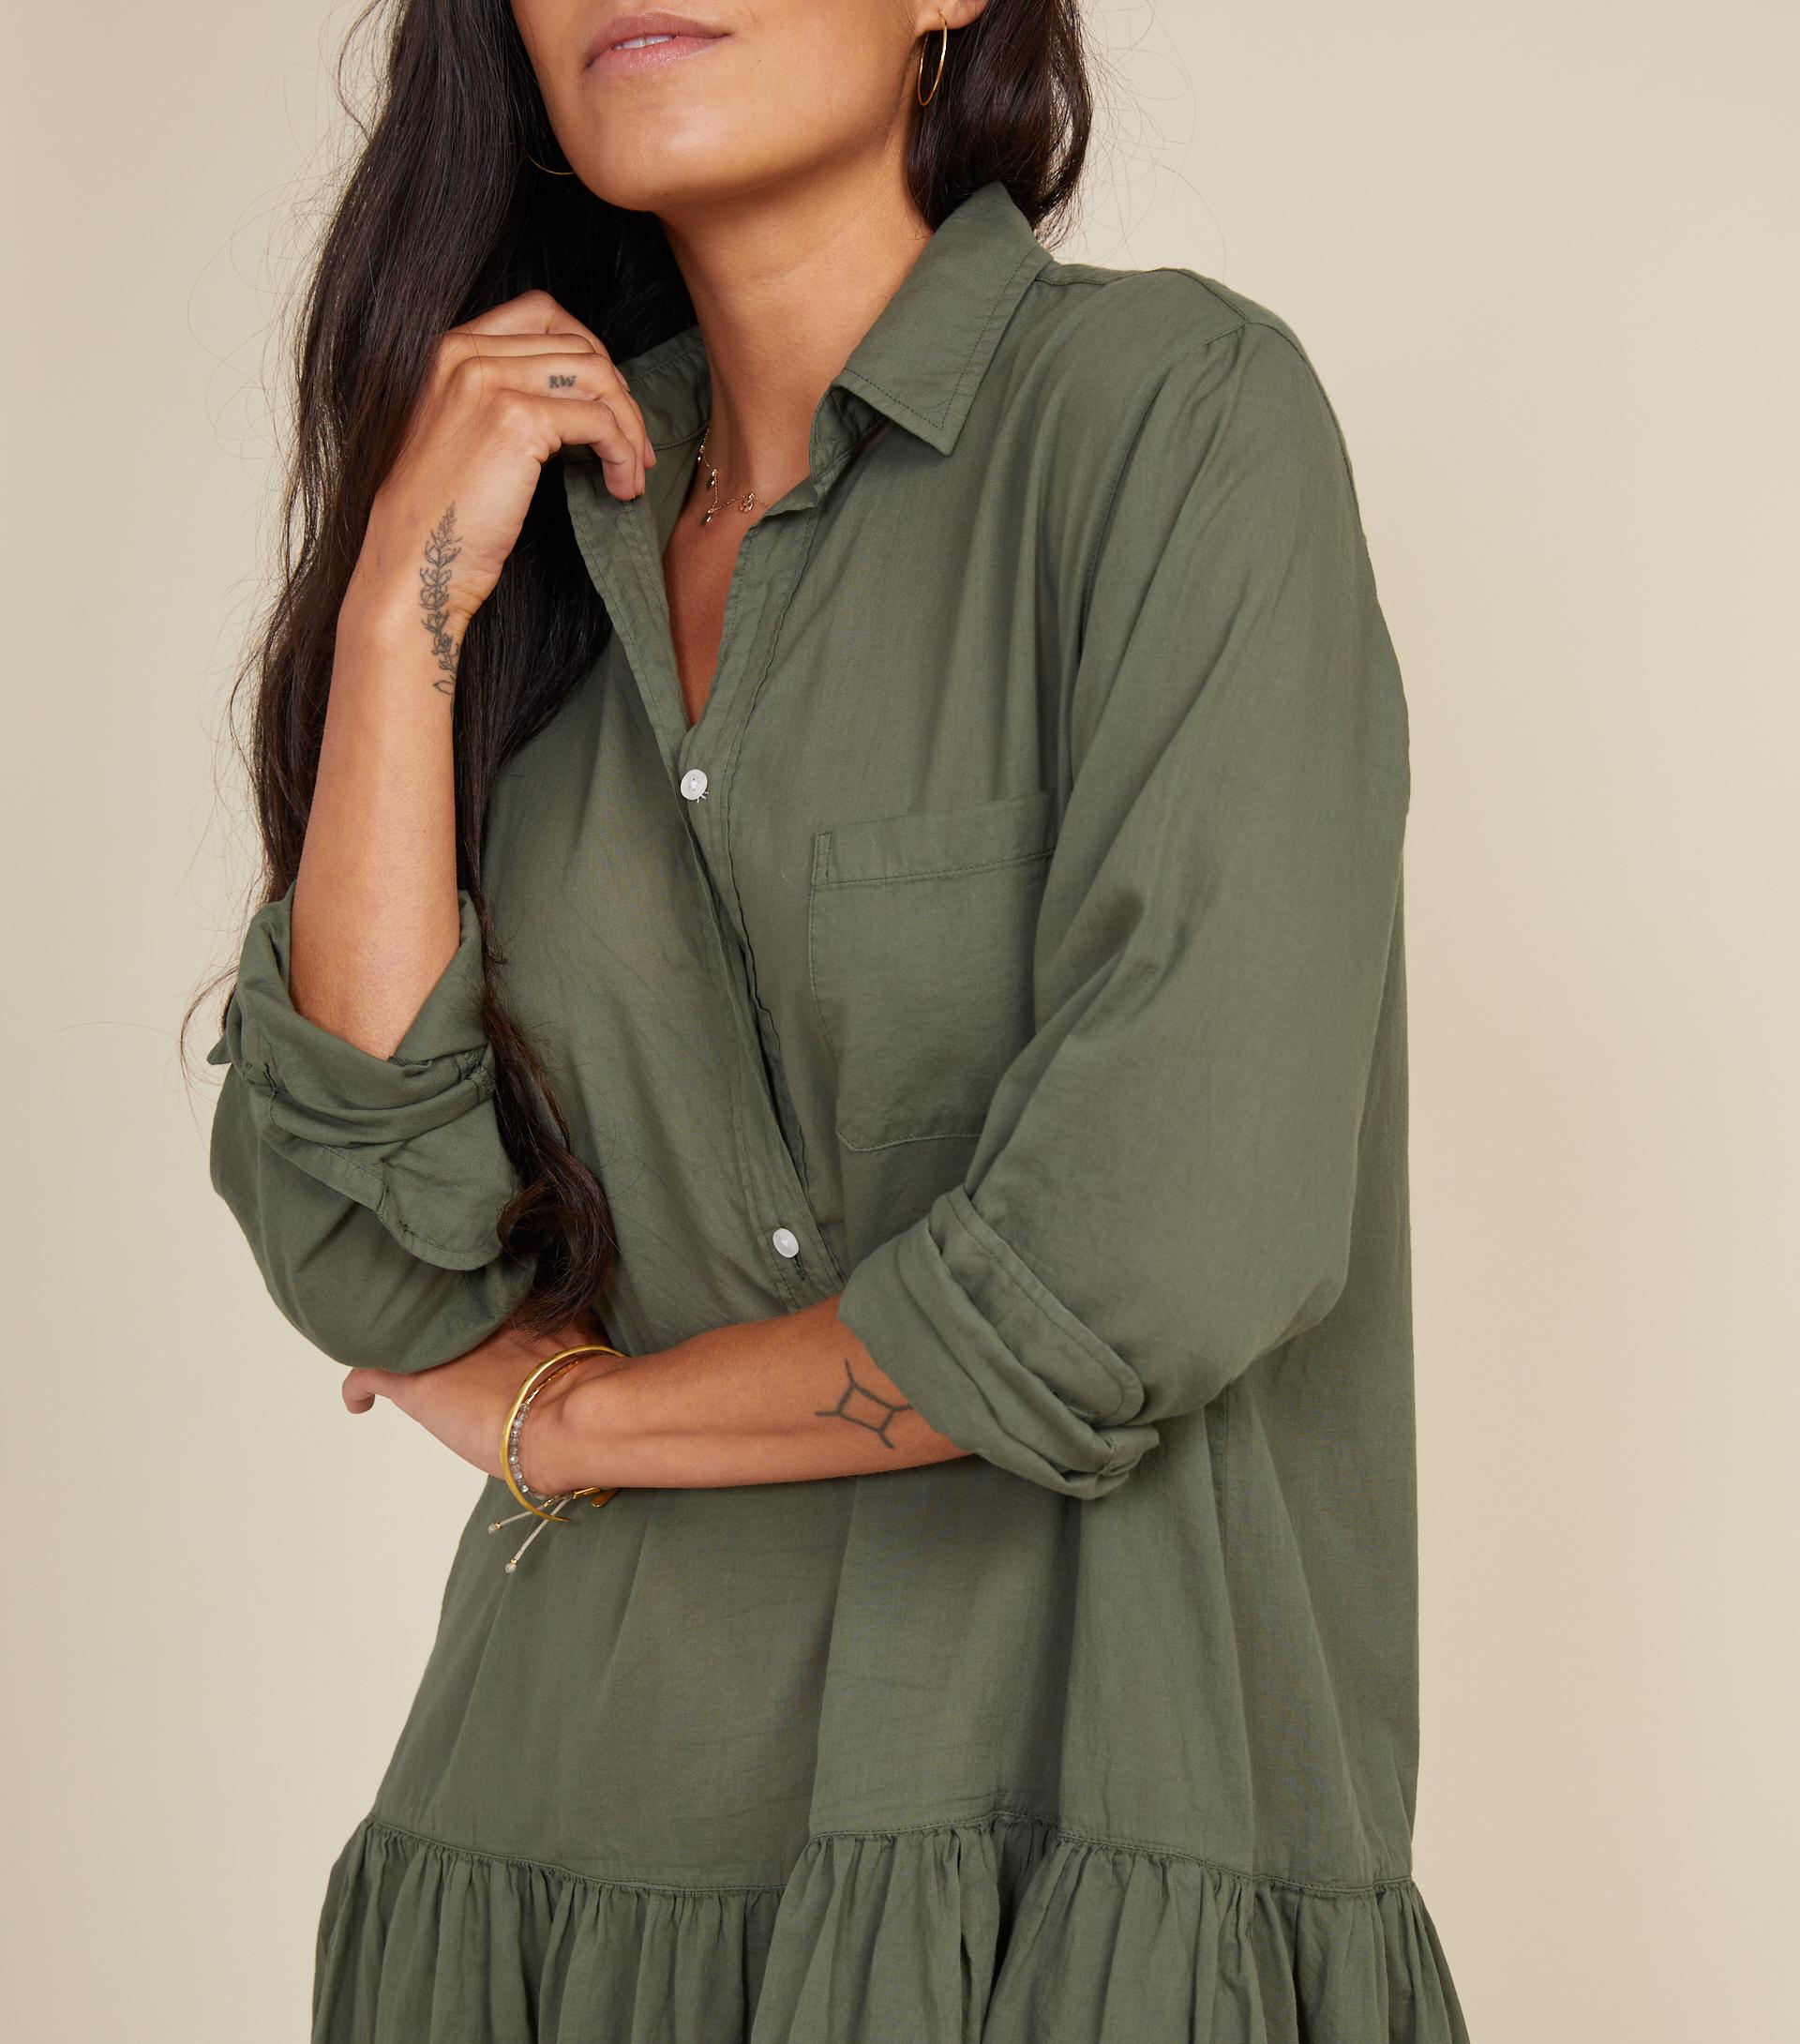 The Changemaker Dress Army Green, Tissue Cotton view 2